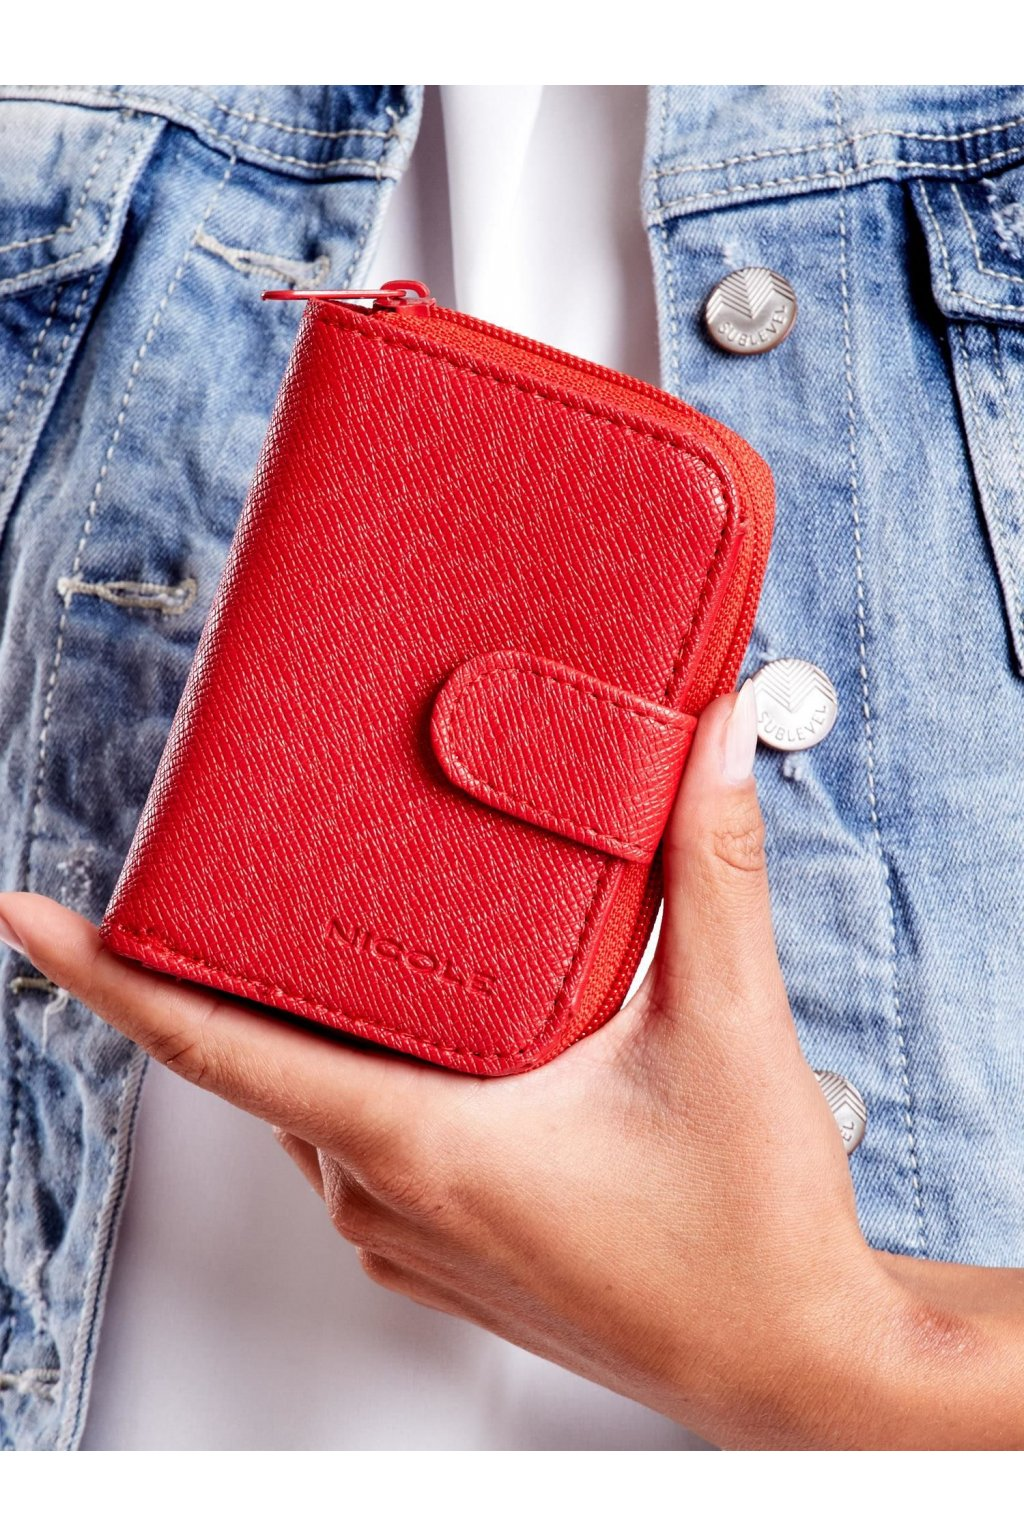 Peňaženka kód G104-nb109